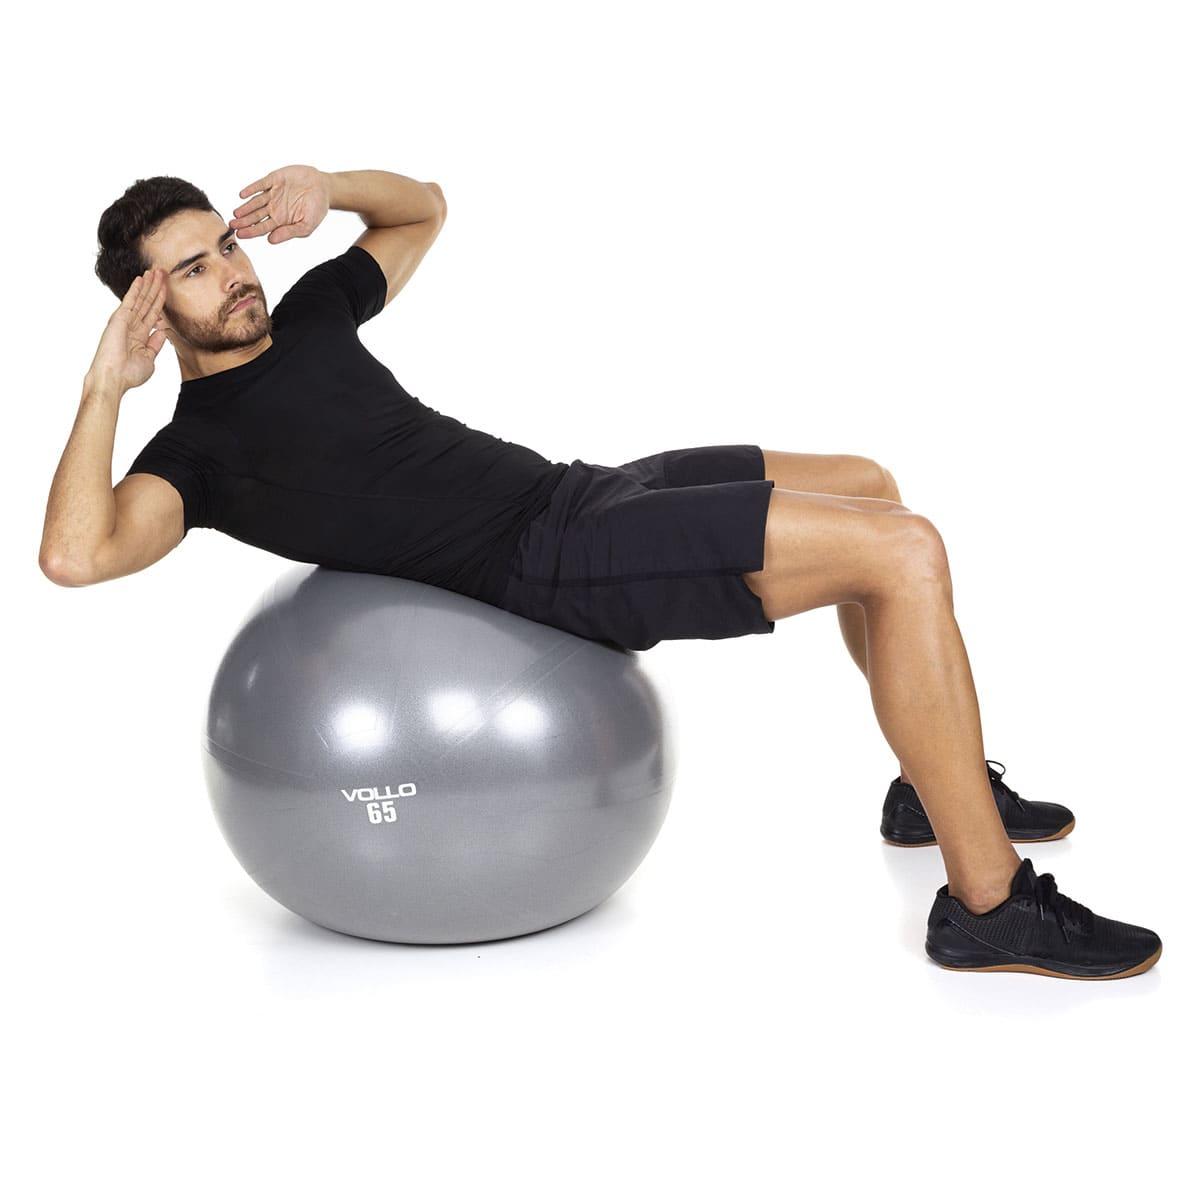 Gym Ball Tam 65 Cm Cinza C/ Res 300 Kg C/ Bomba